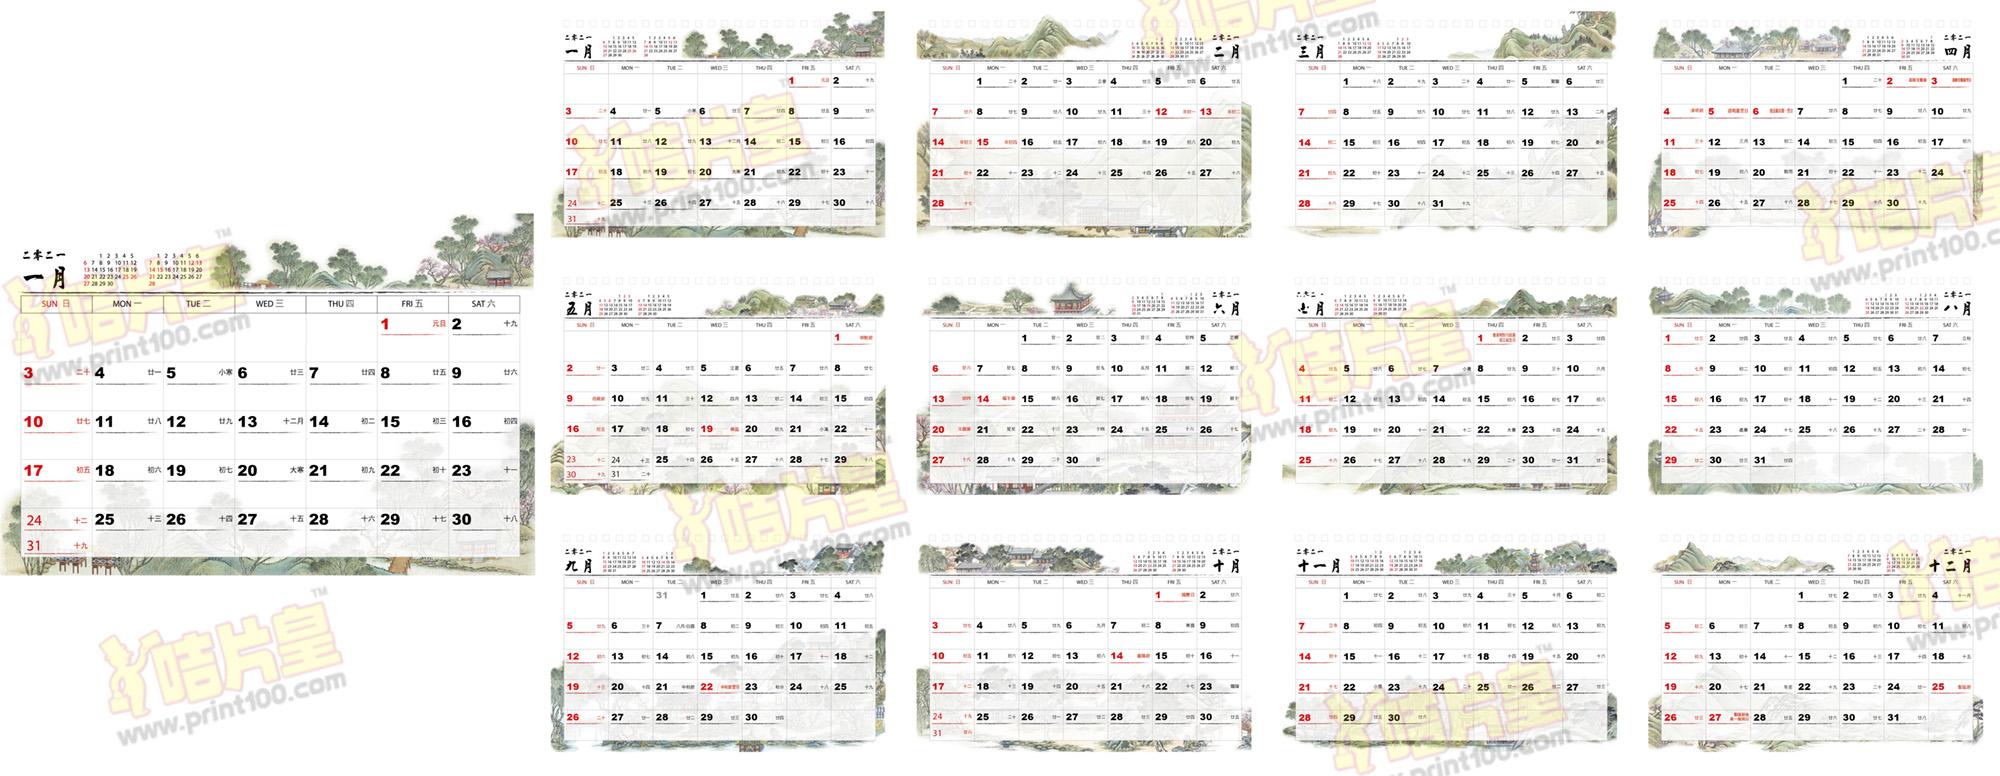 Print100 Standard Content Design for Variant Calendar C